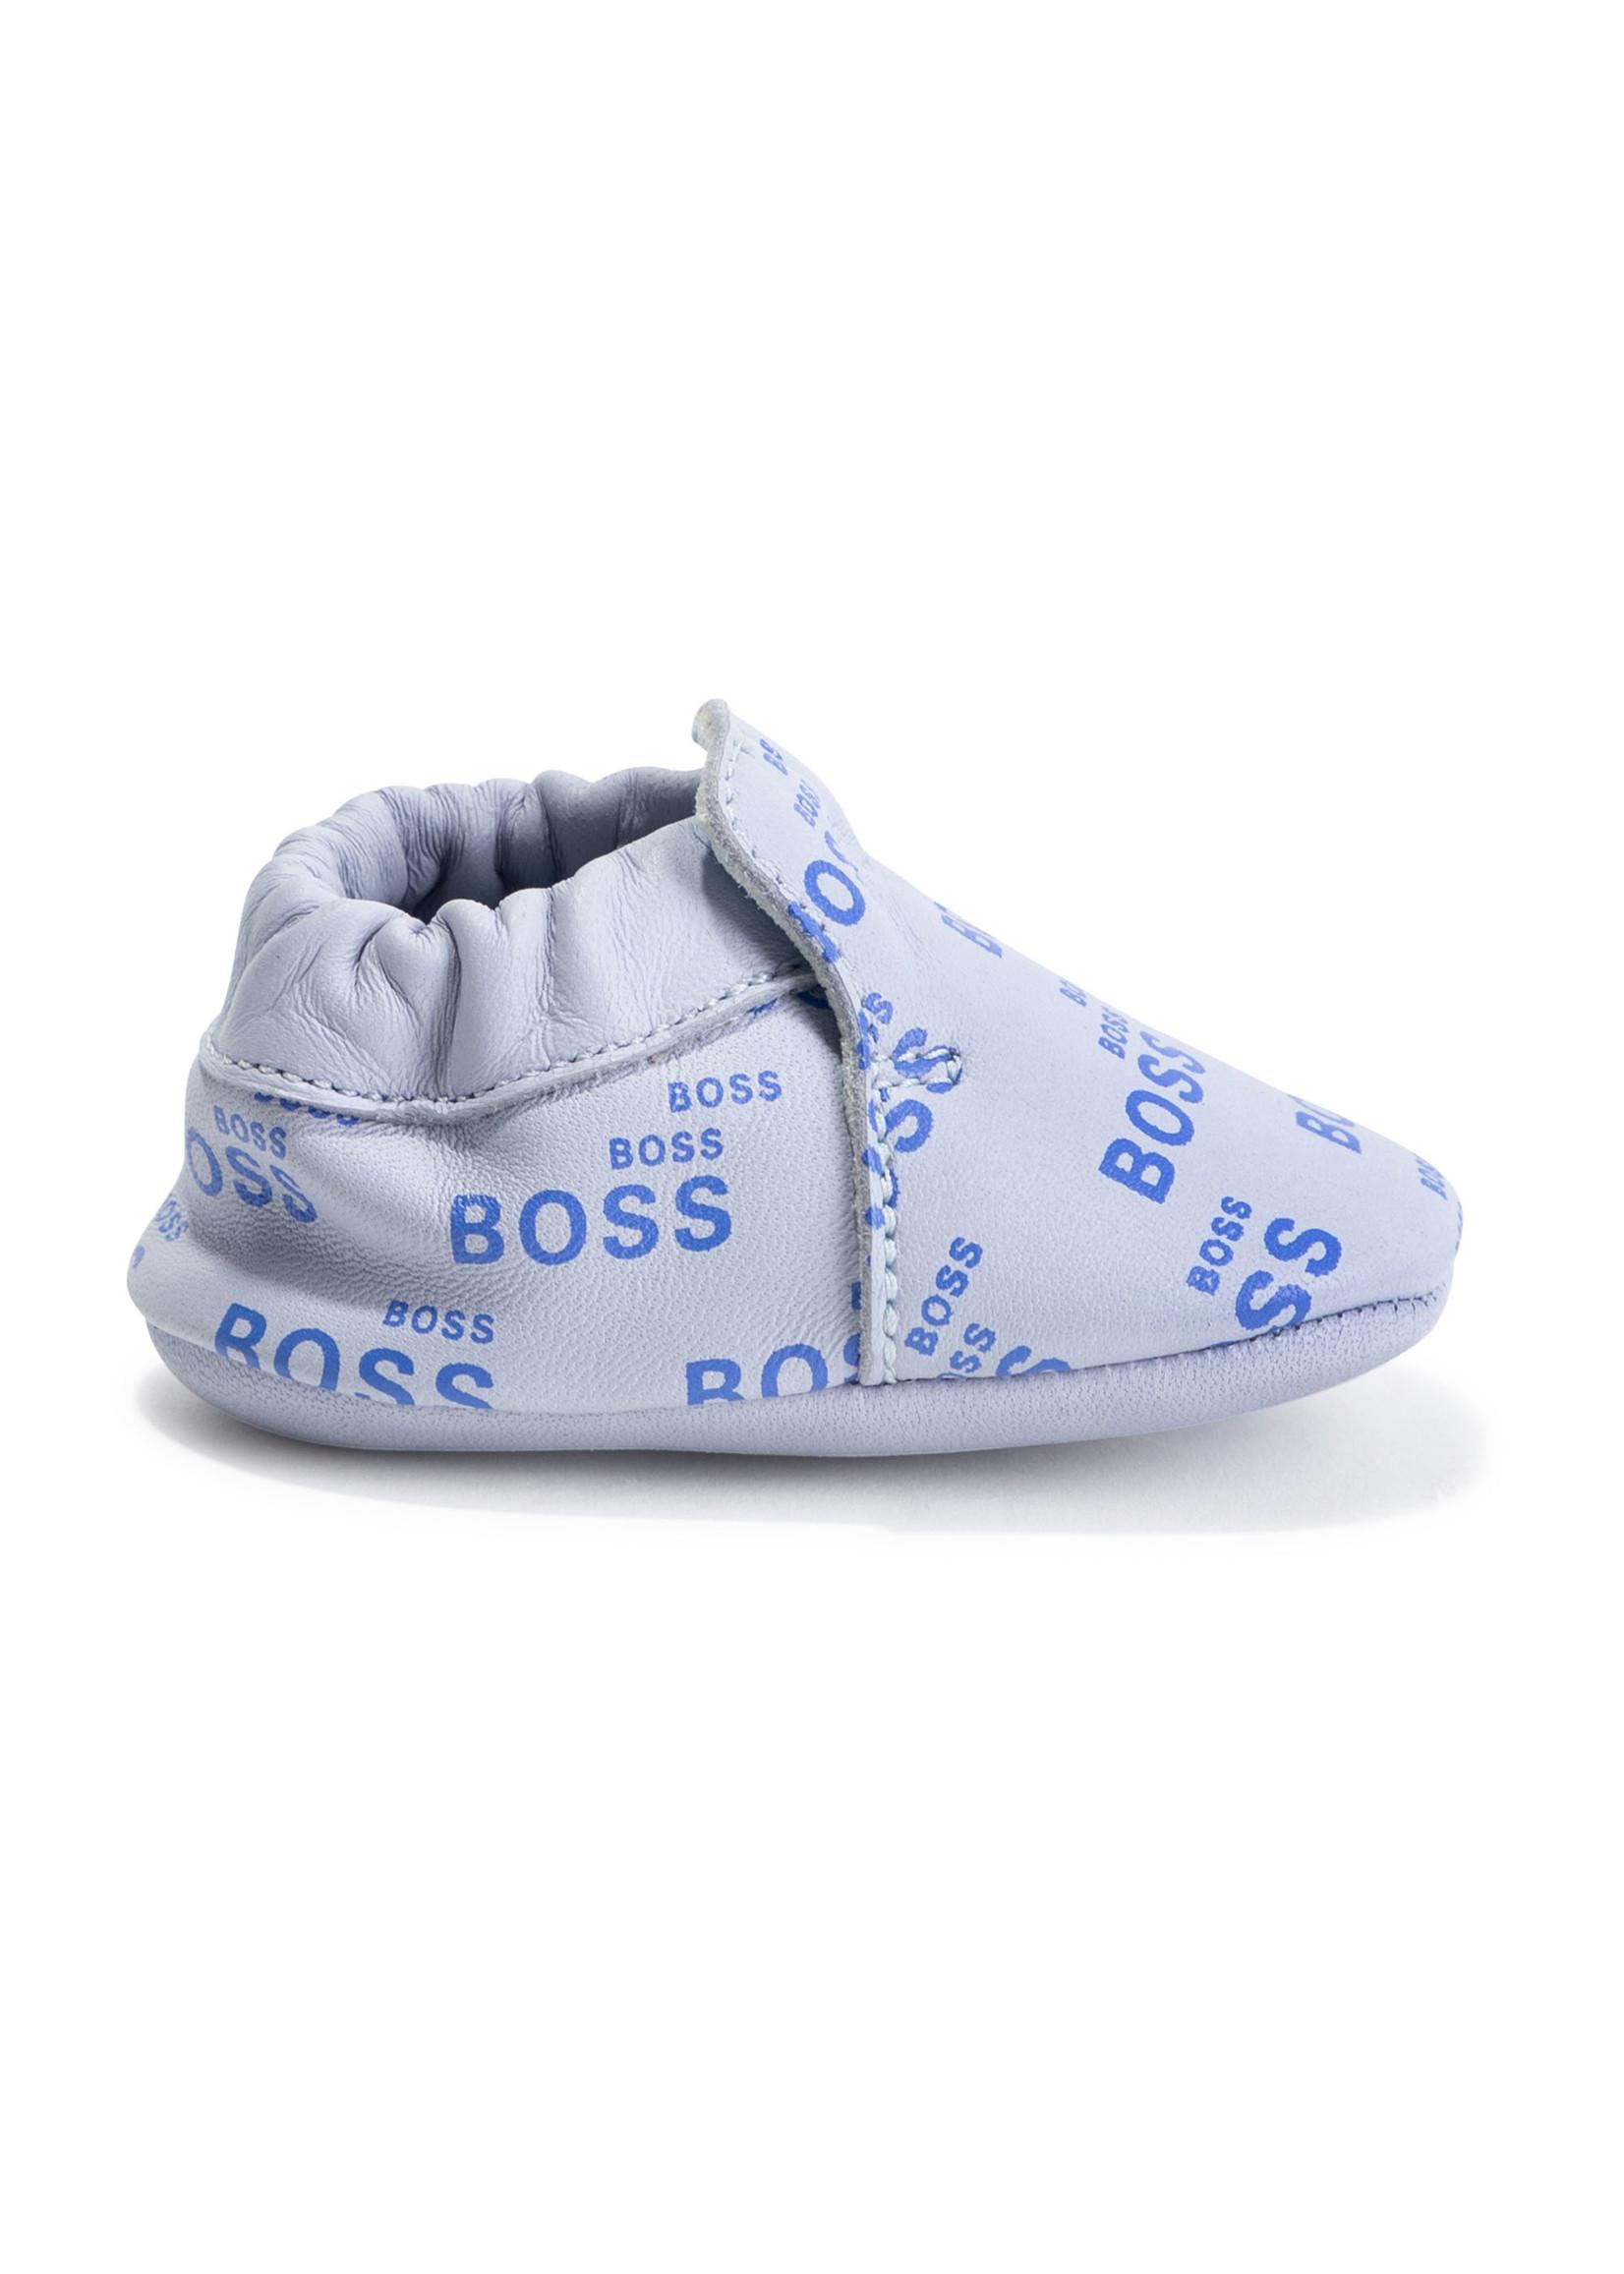 "HUGO BOSS HUGO BOSS Schoentjes ""Boss"" lichtblauw"